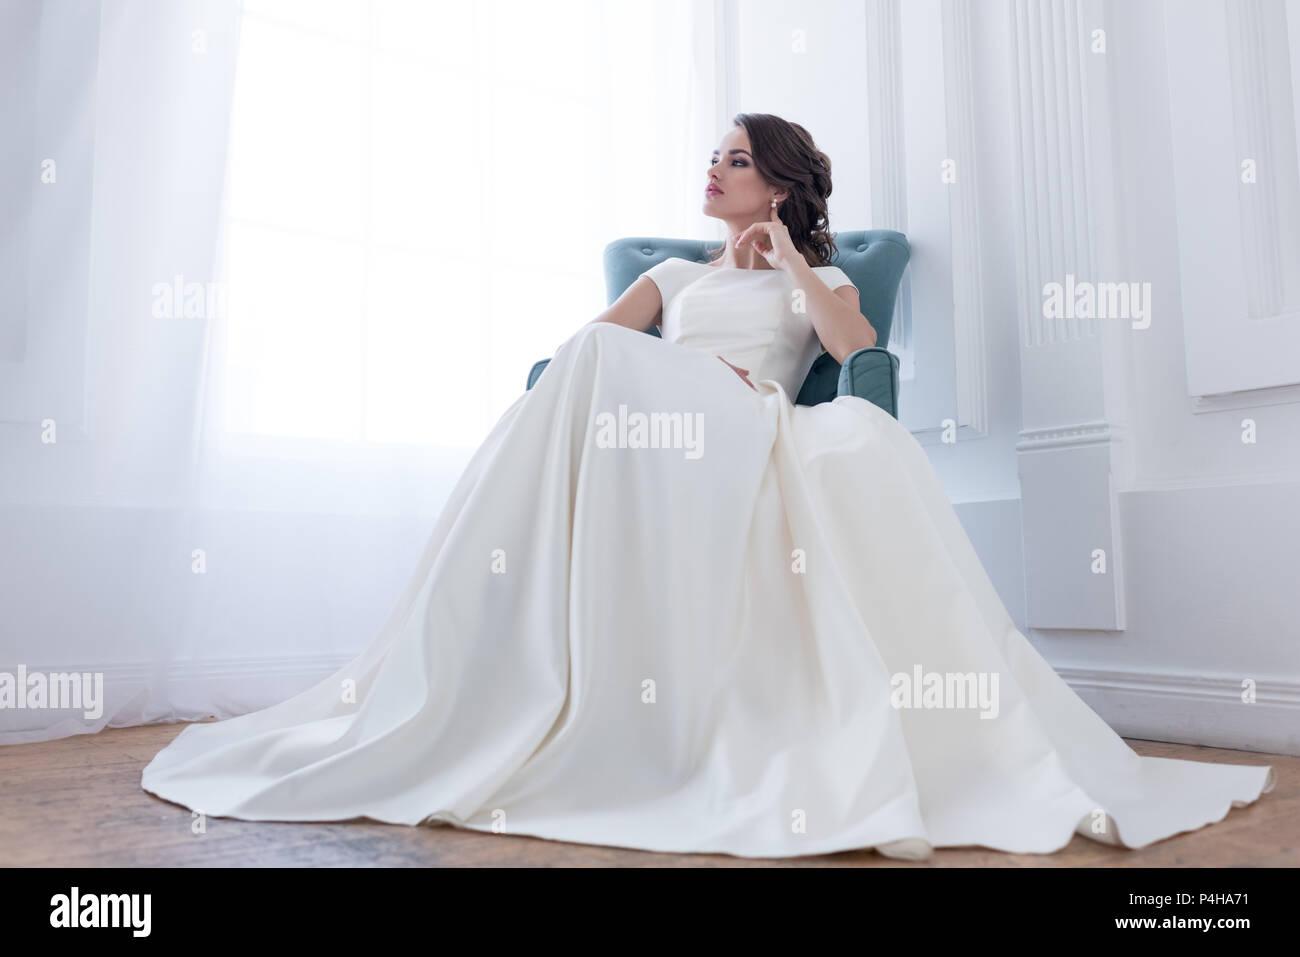 Attractive Brute Woman In Wedding Dress Sitting Armchair: Haute Couture Wedding Dress Sitting At Reisefeber.org